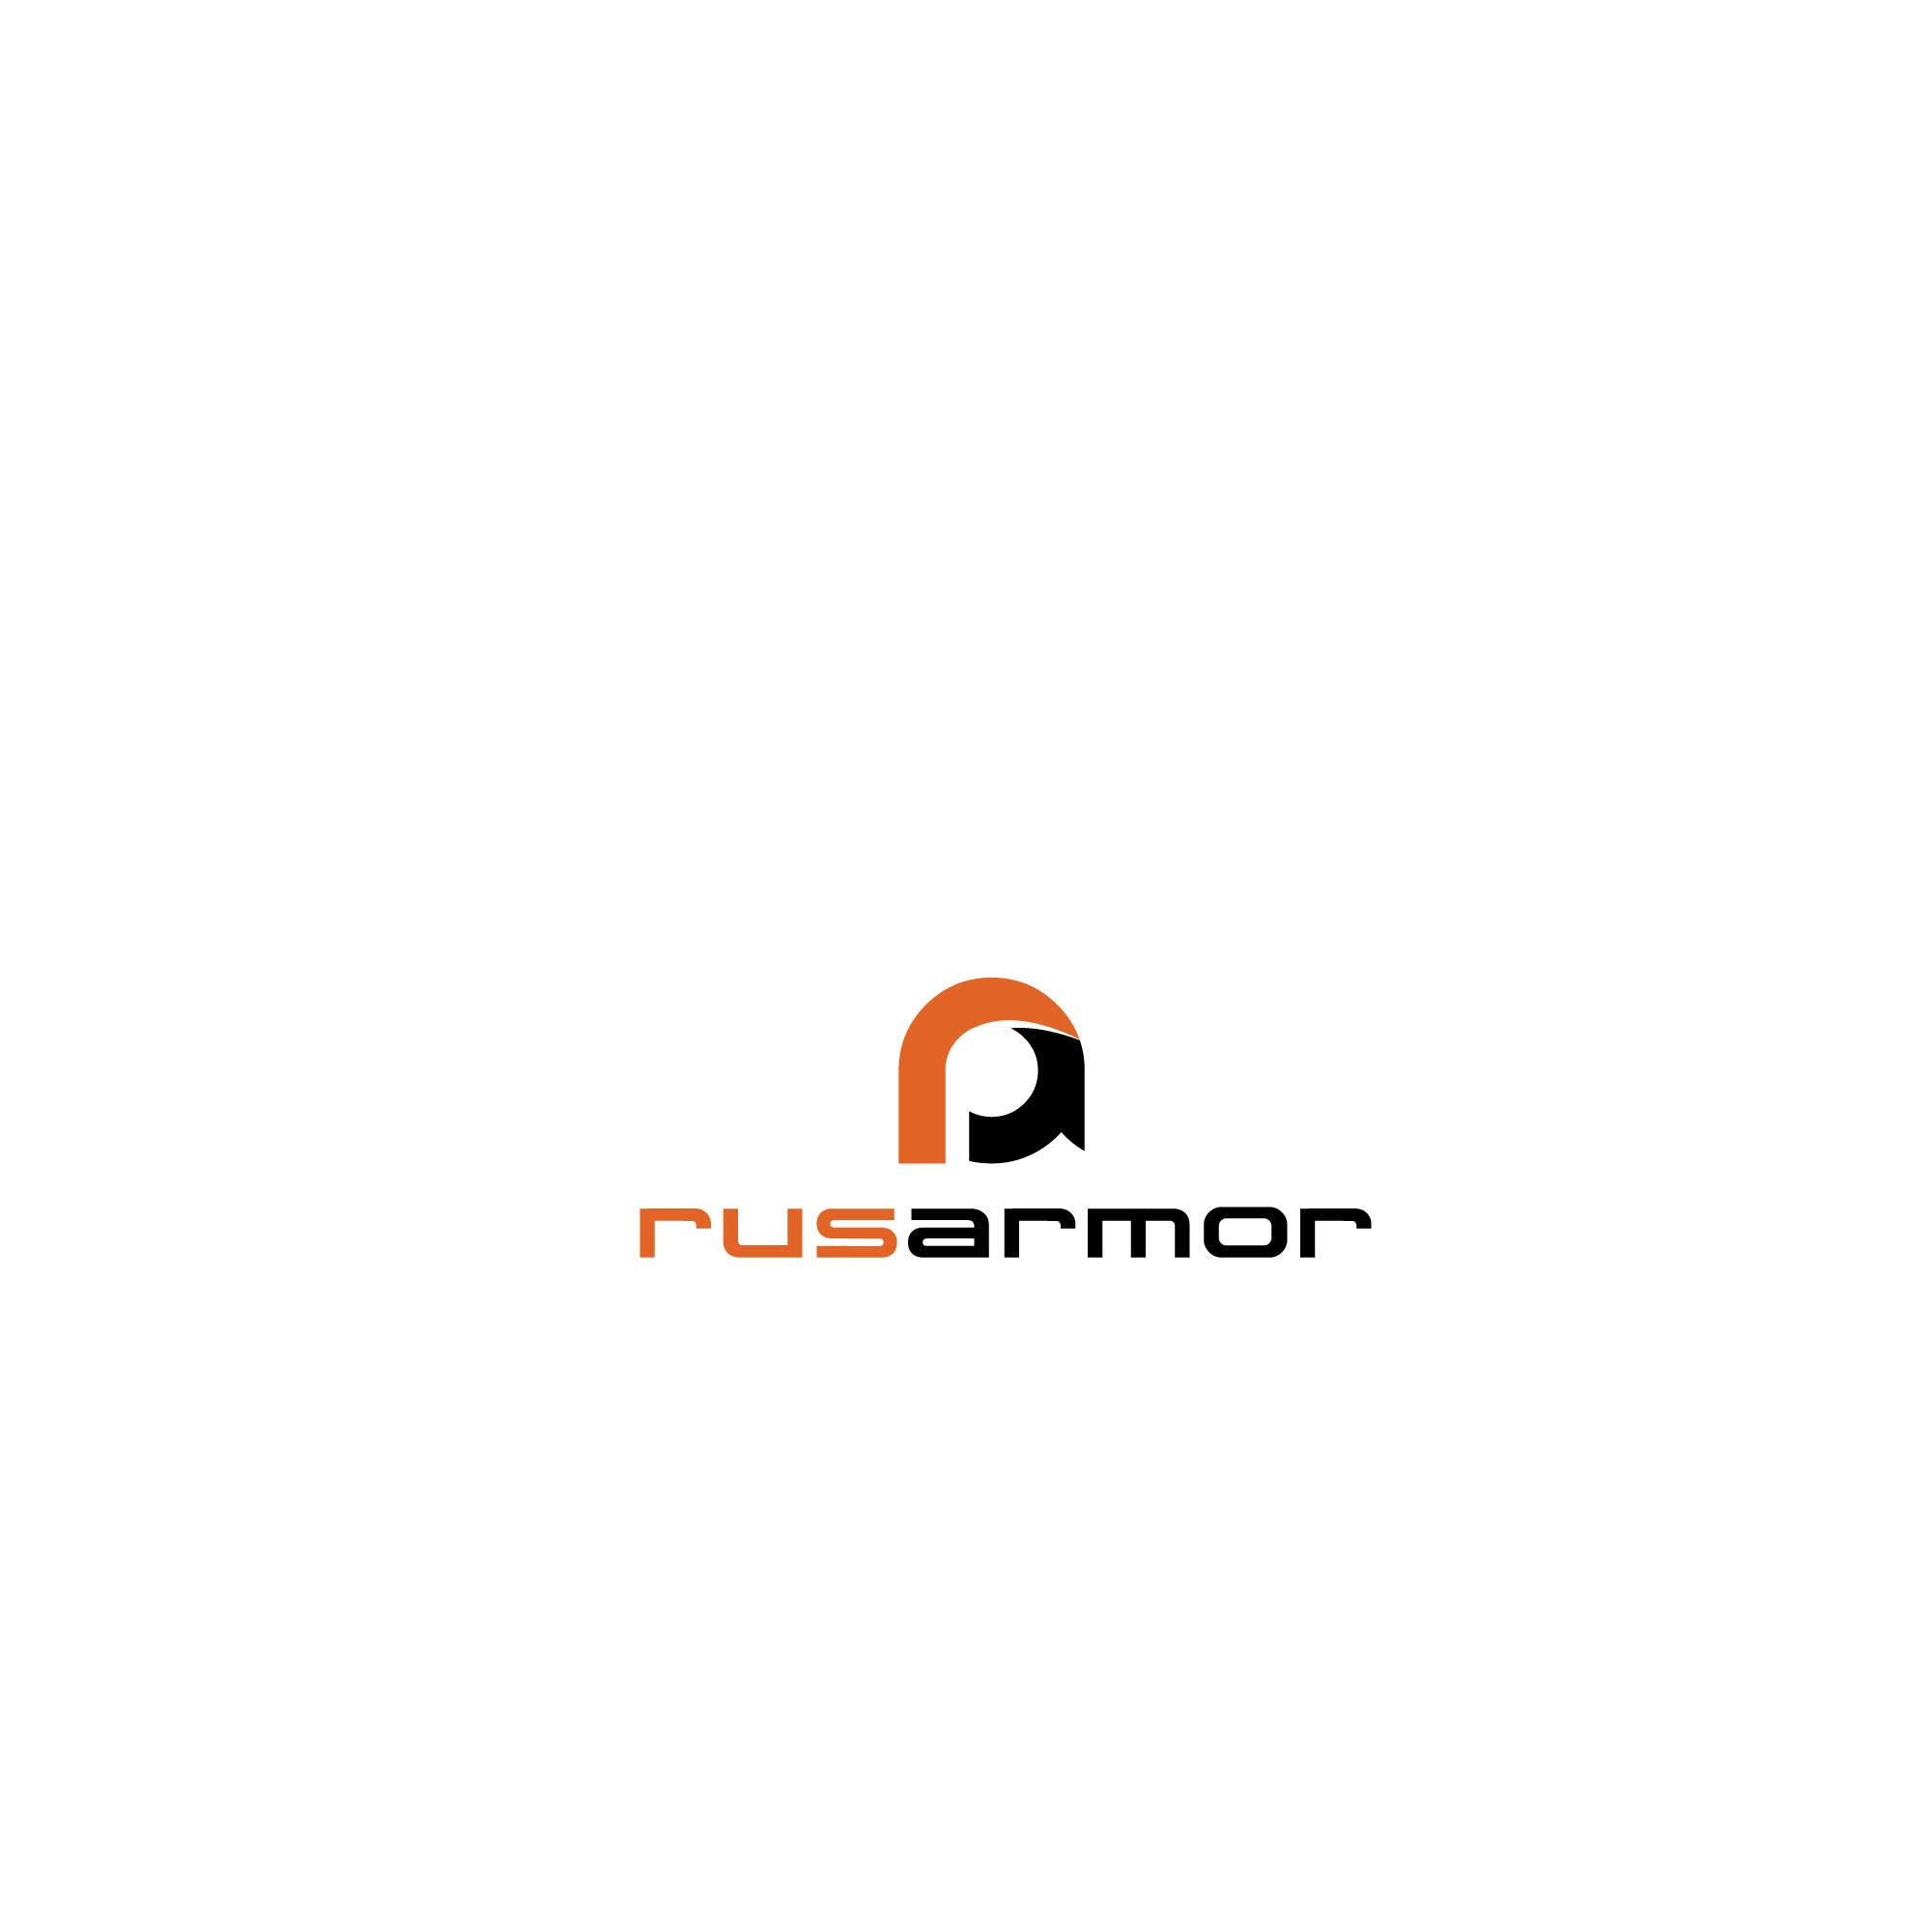 Разработка логотипа технологического стартапа РУСАРМОР фото f_3315a0aede60437c.jpg